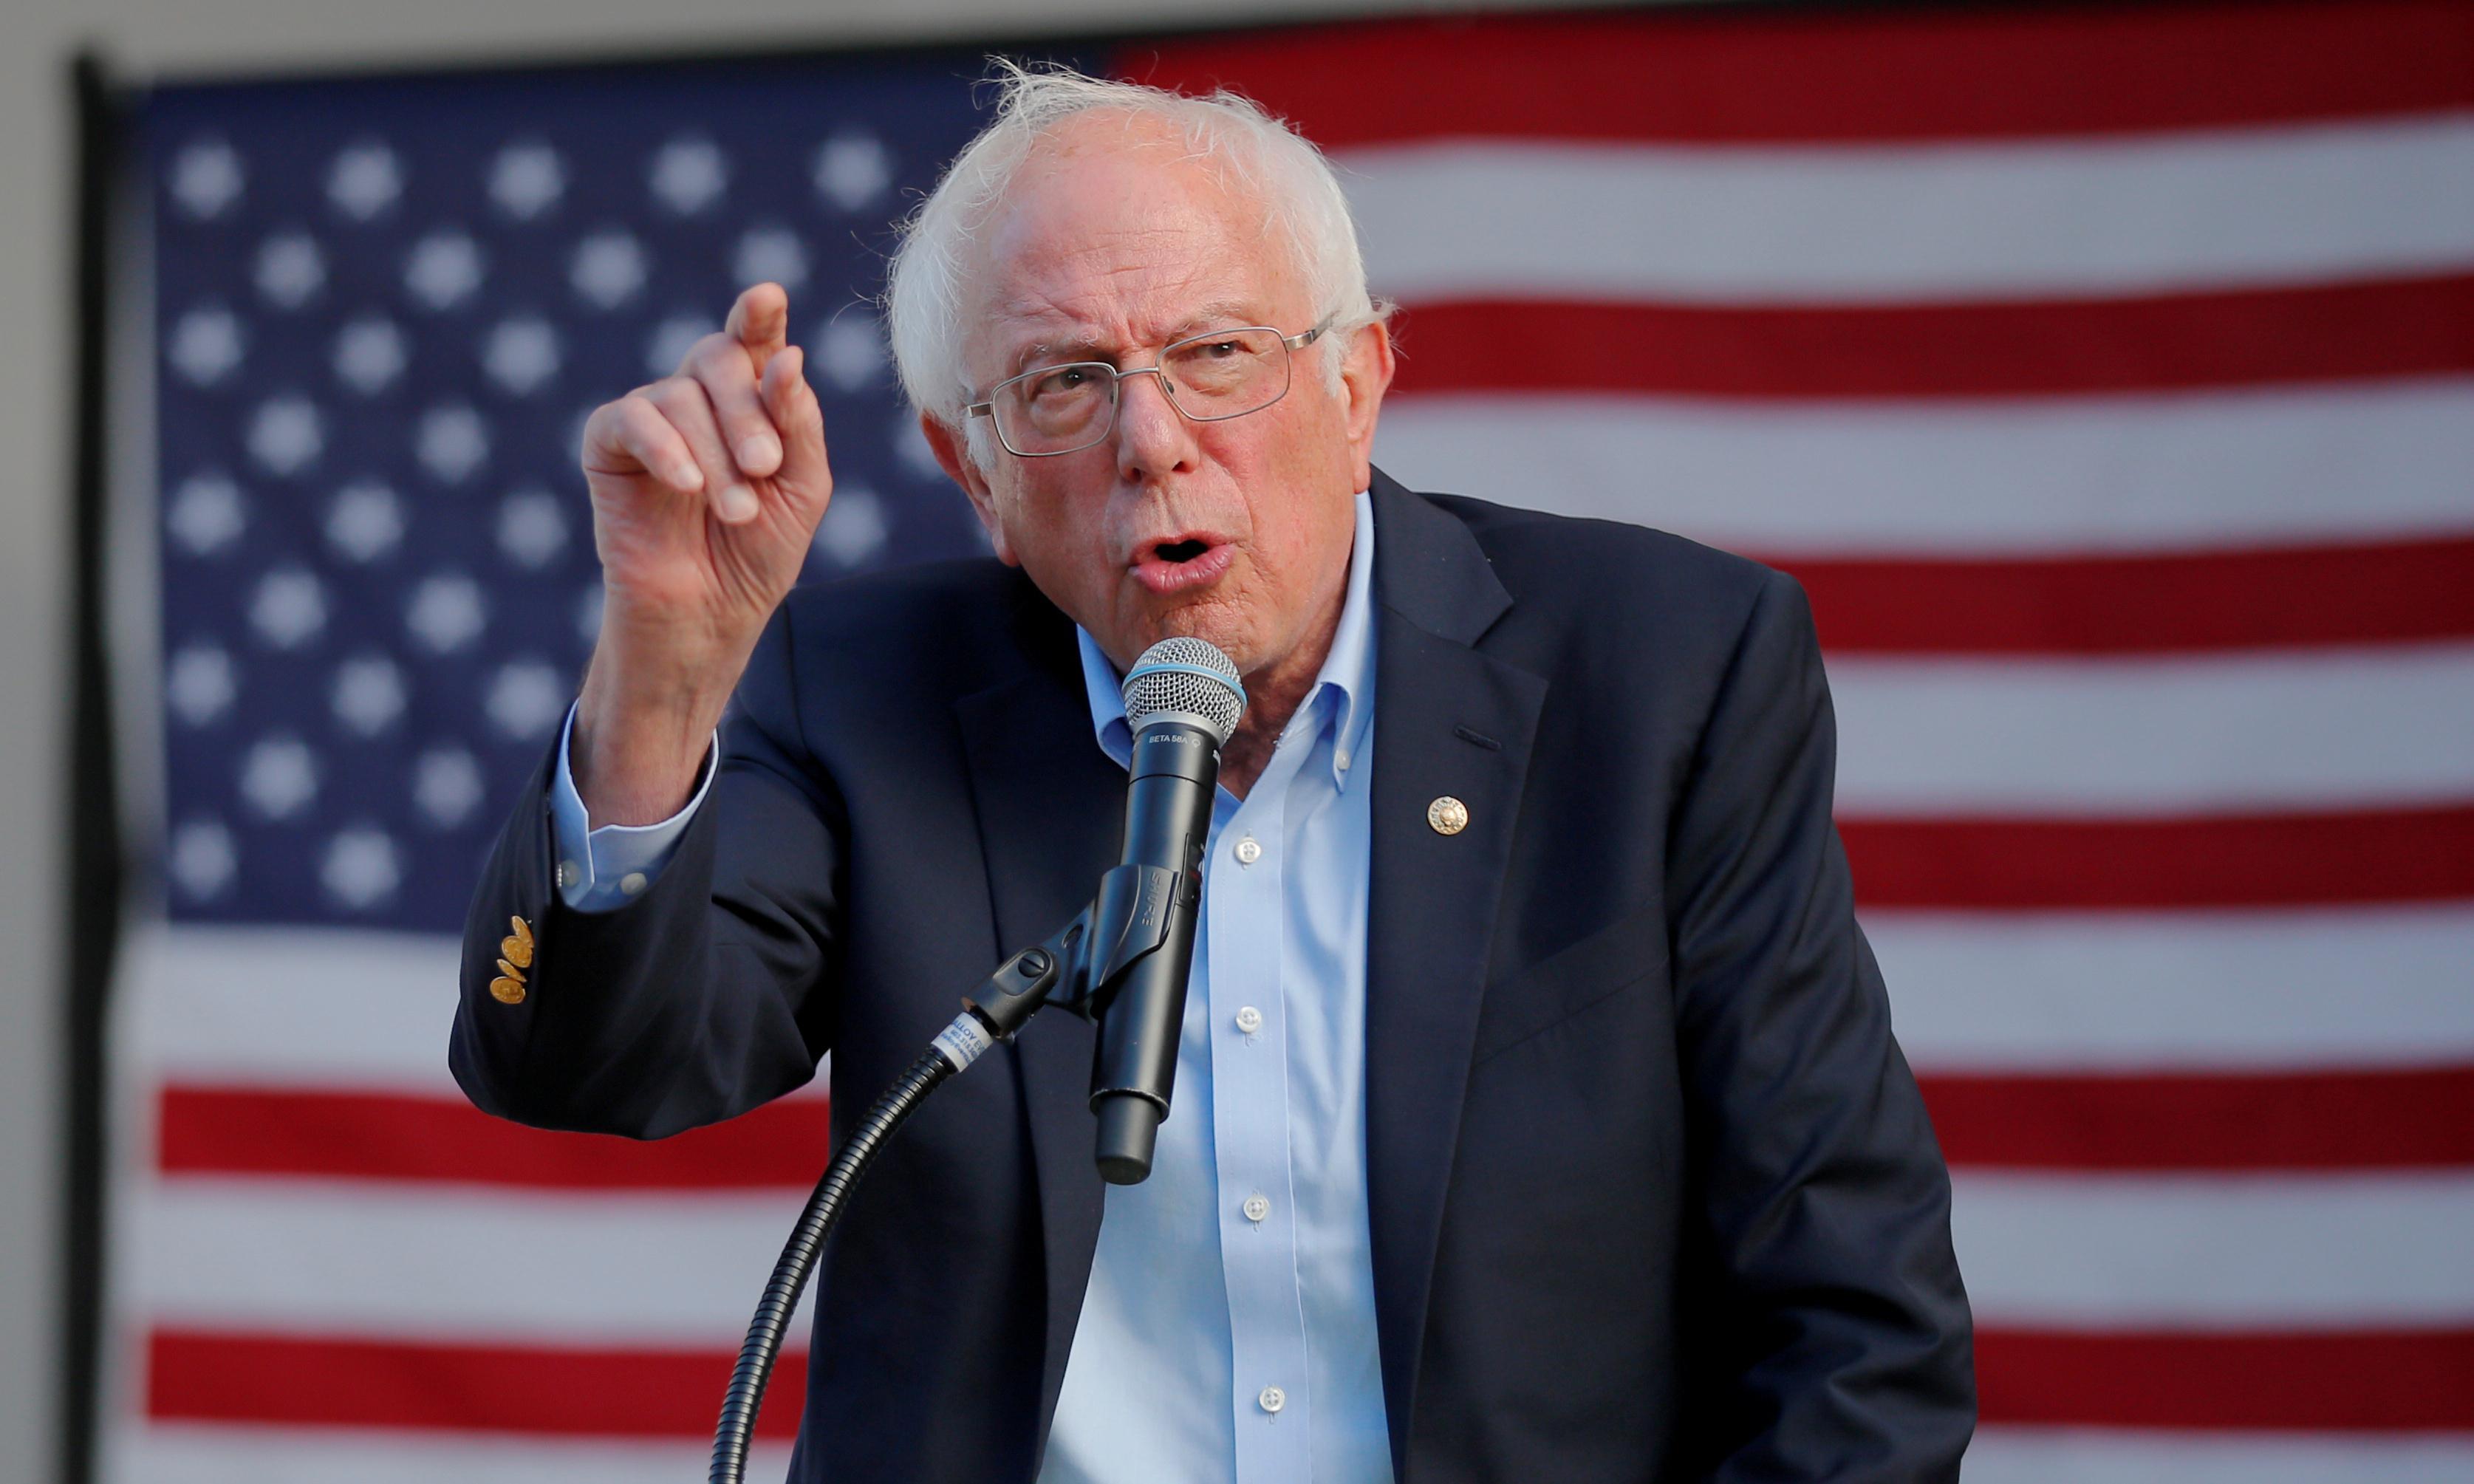 Alexandria Ocasio-Cortez knows: Bernie Sanders is the most progressive choice